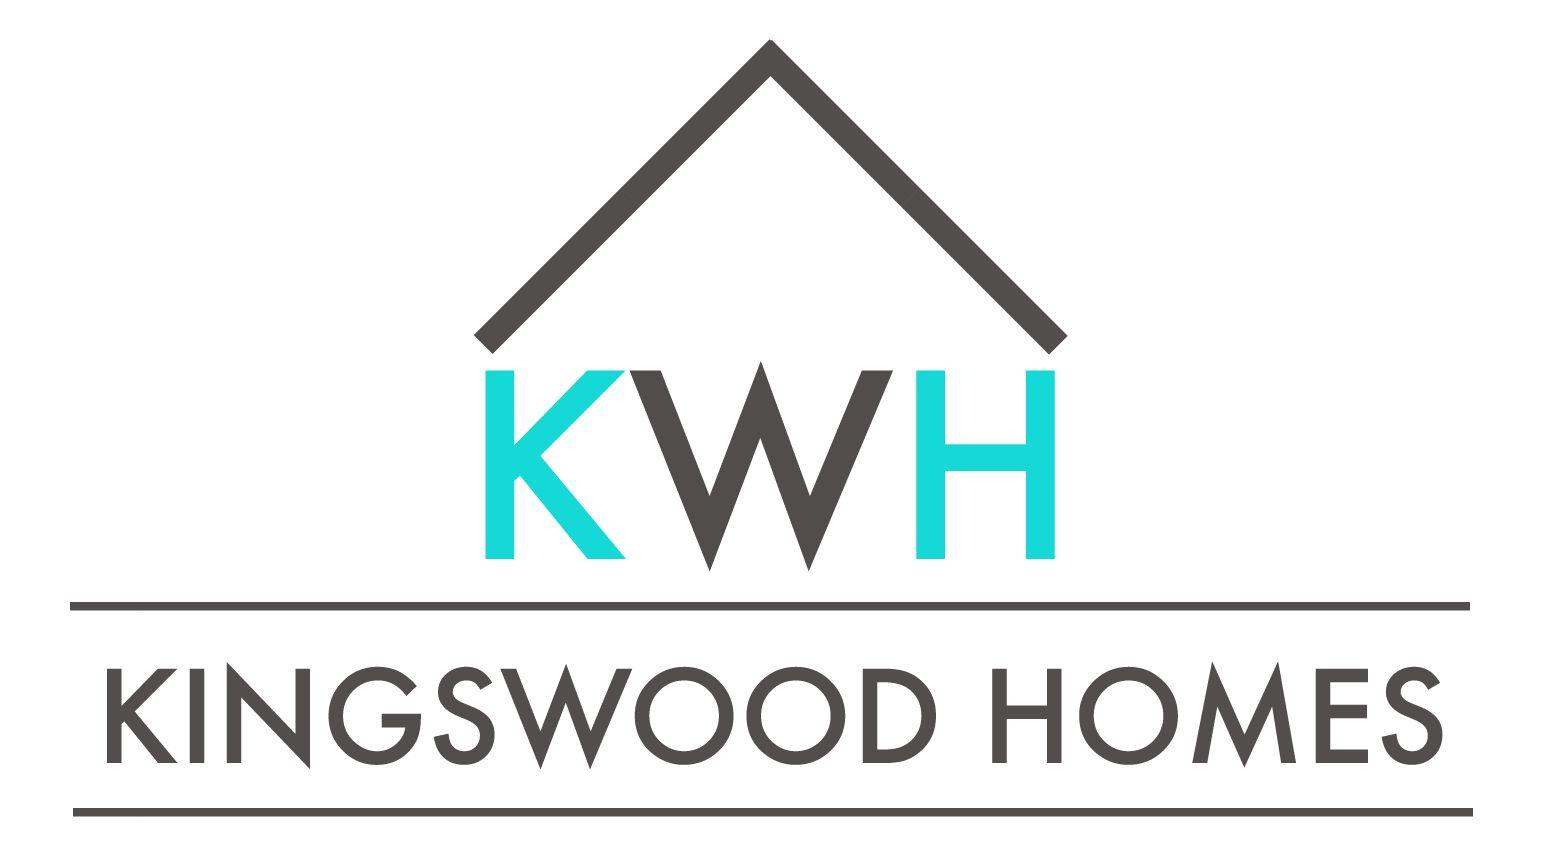 Kingswood Homes,48308